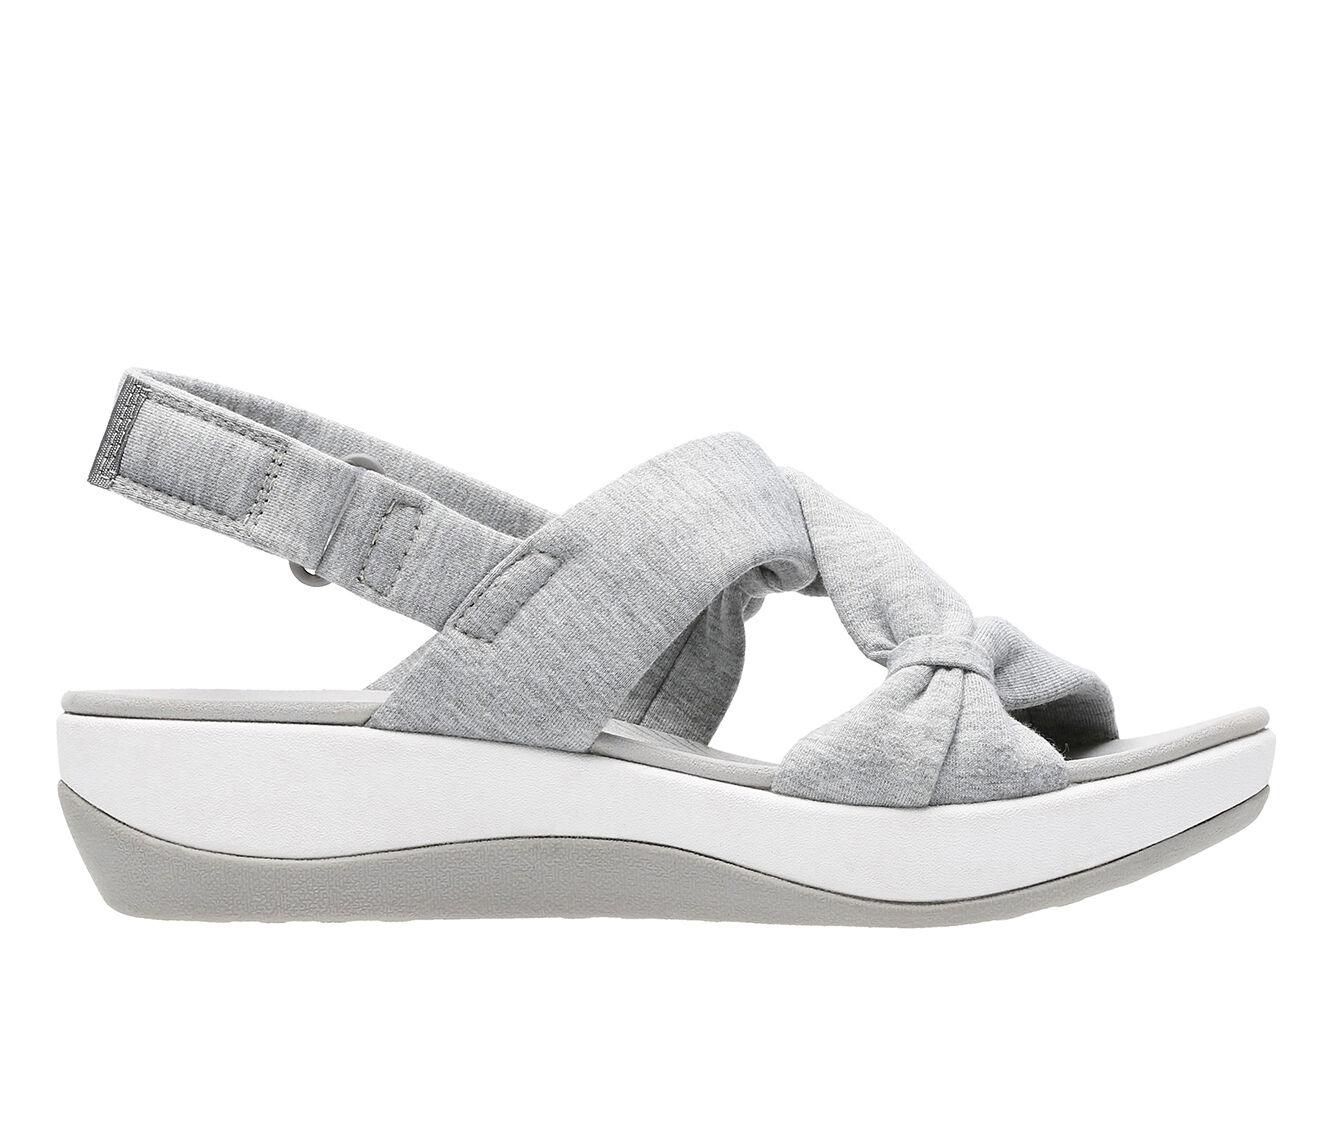 Women's Clarks Arla Primrose Sandals Grey